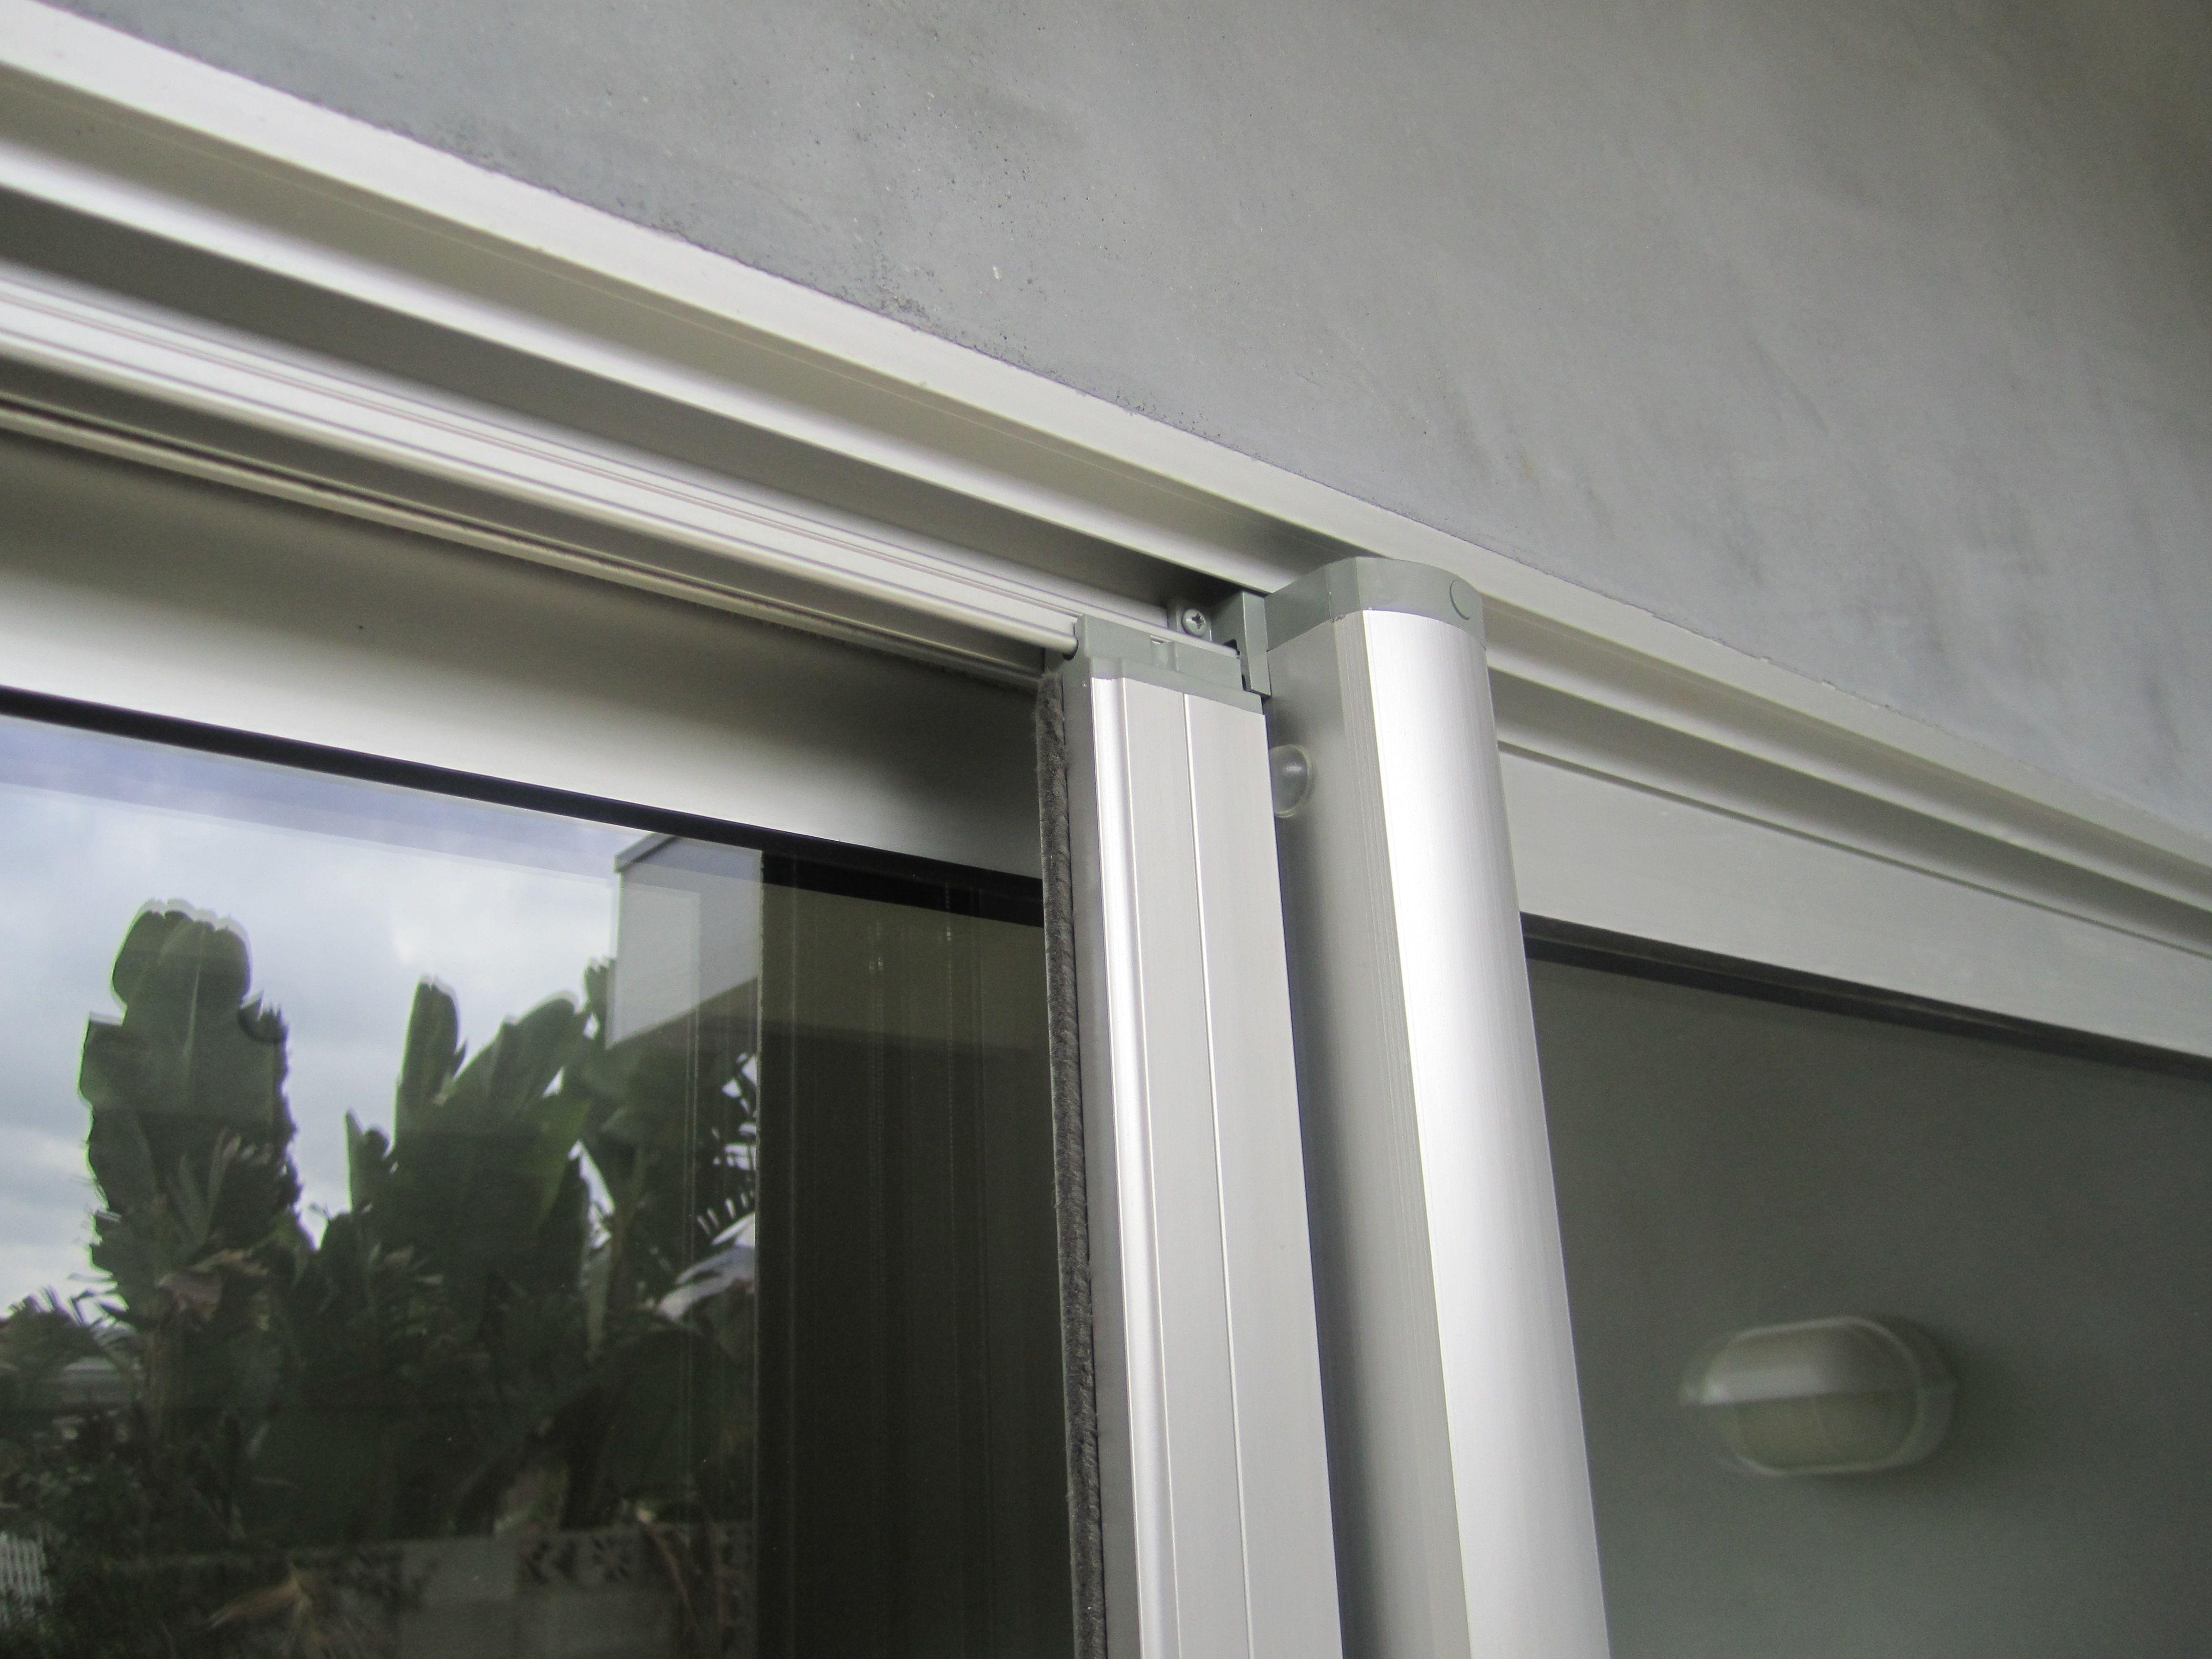 Retractable Patio Doors Retractable Screen Door For A Patio Sliding Screen Door Screen Doors Solarium Ideas Patio Doors